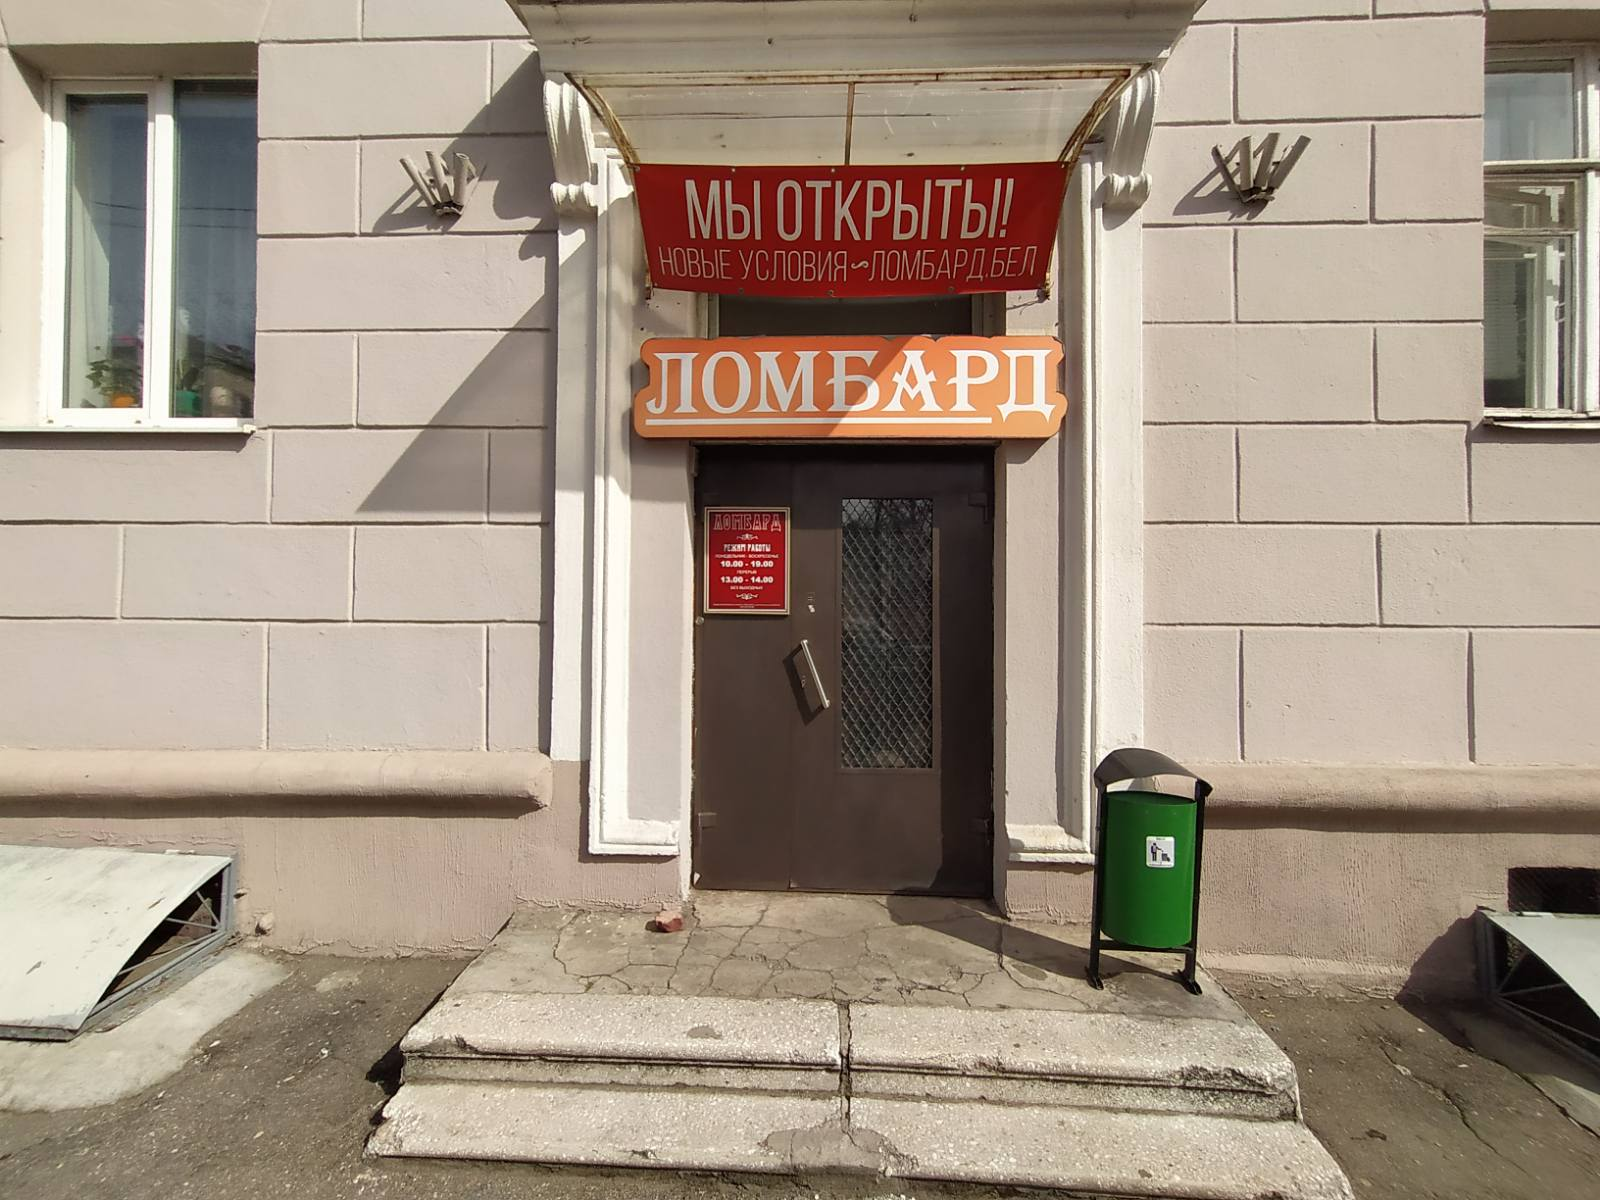 Ломбард по адресу г.Минск, ул.Я.Коласа, 51/1